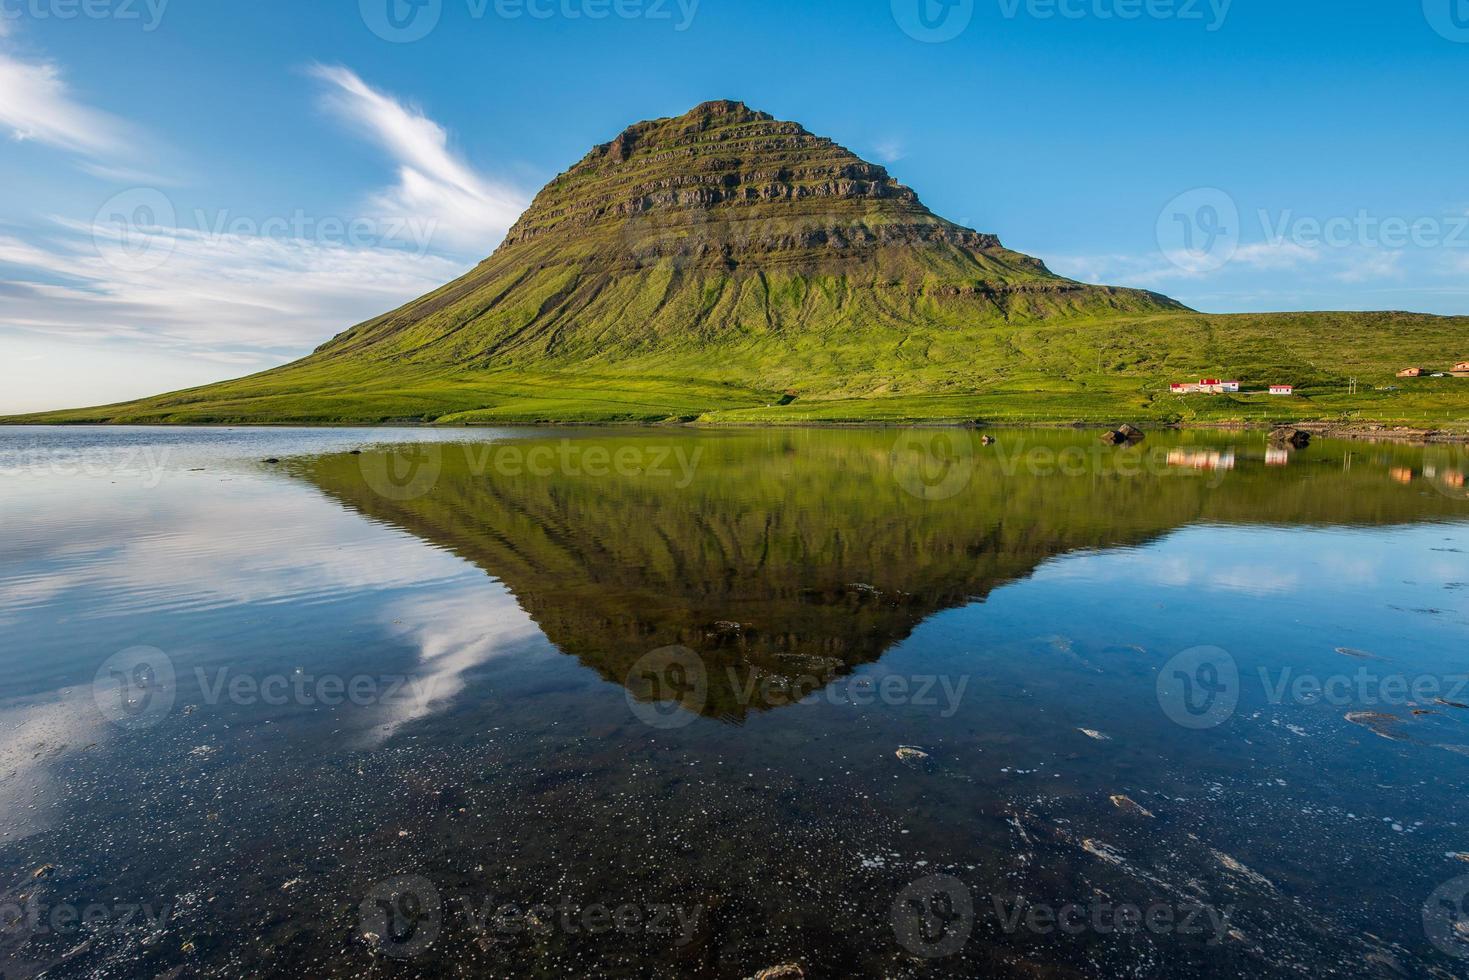 kirkjufell mount, snaefellsnes halvön, island foto